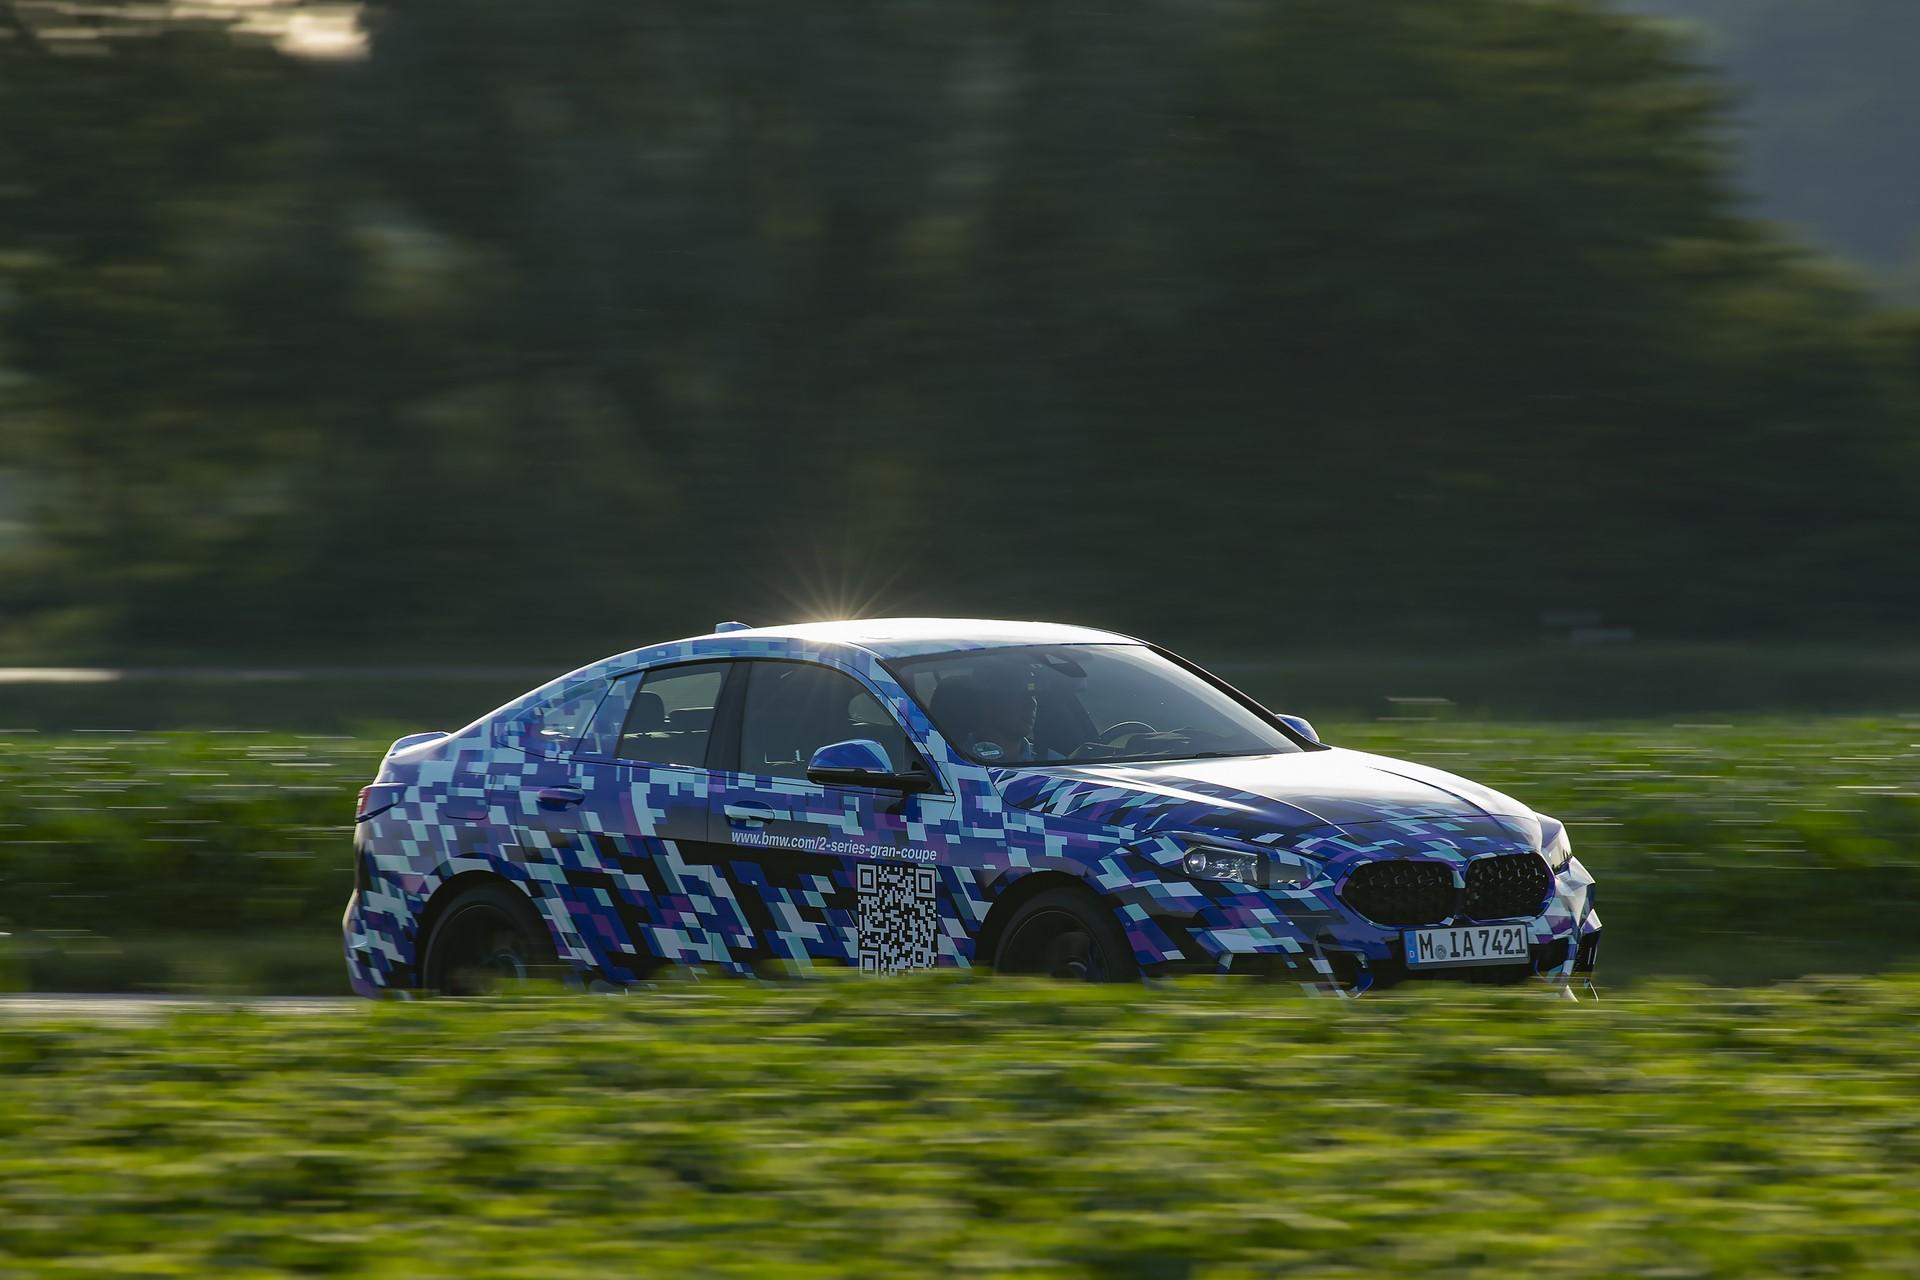 BMW-2-Series-Gran-Coupe-2020-spy-photos-12